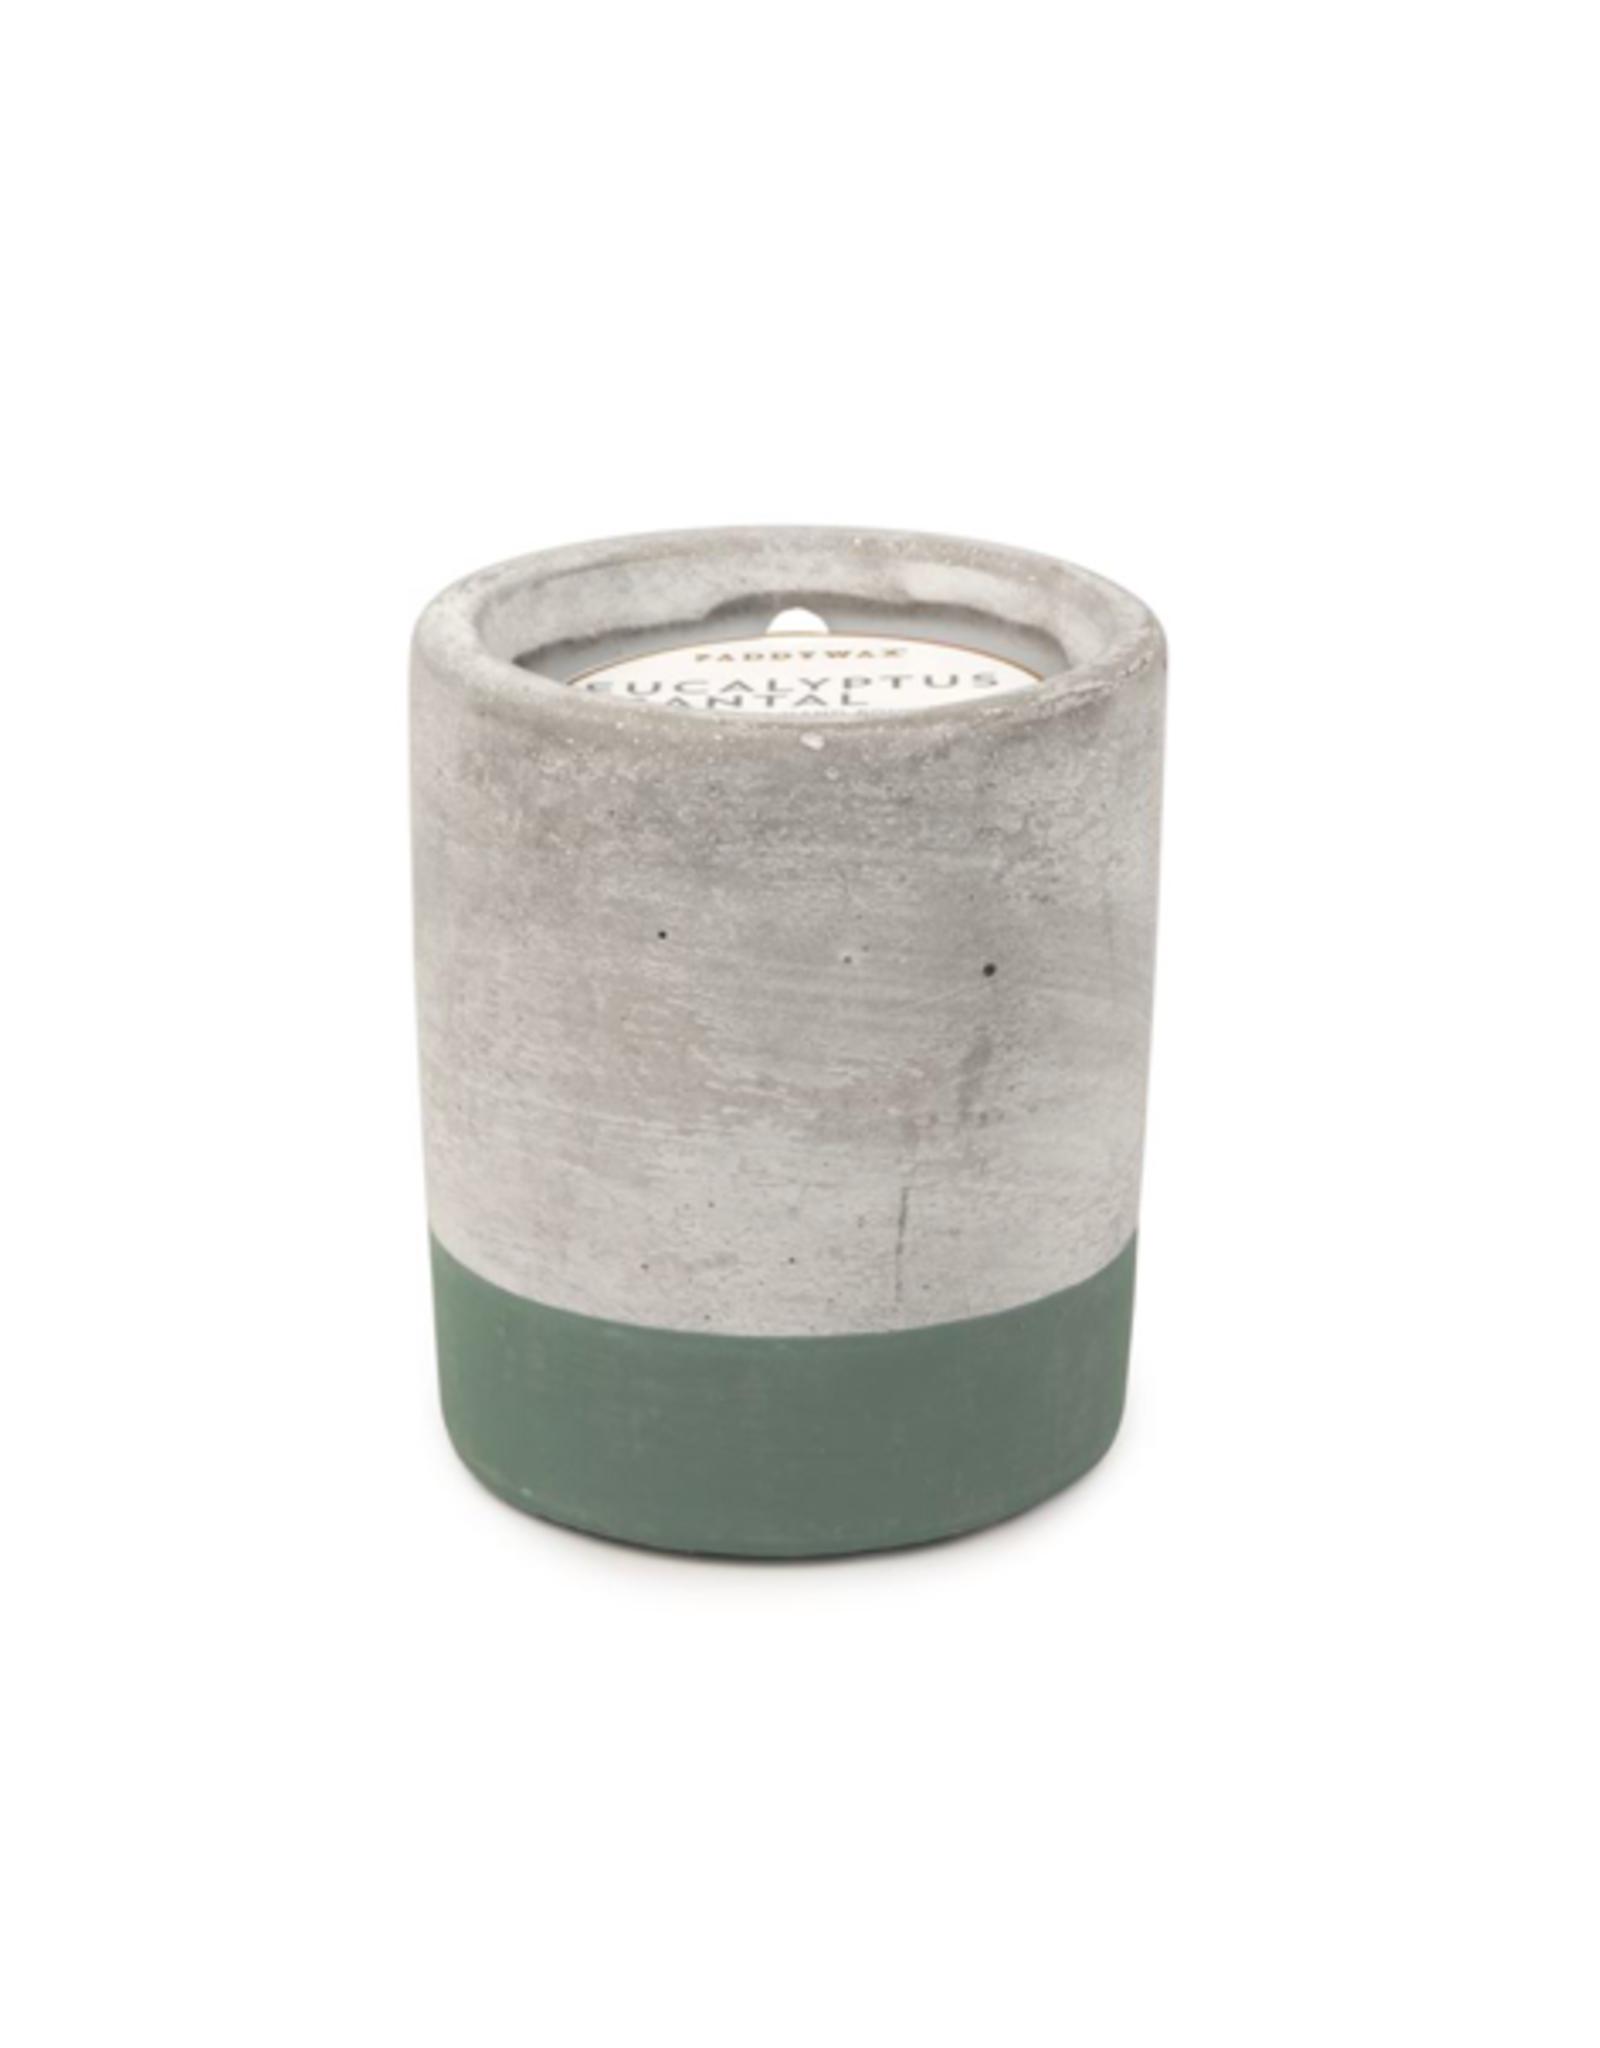 PAX - Soy Candle/Eucalyptus Santal, Green Concrete, 3.5oz